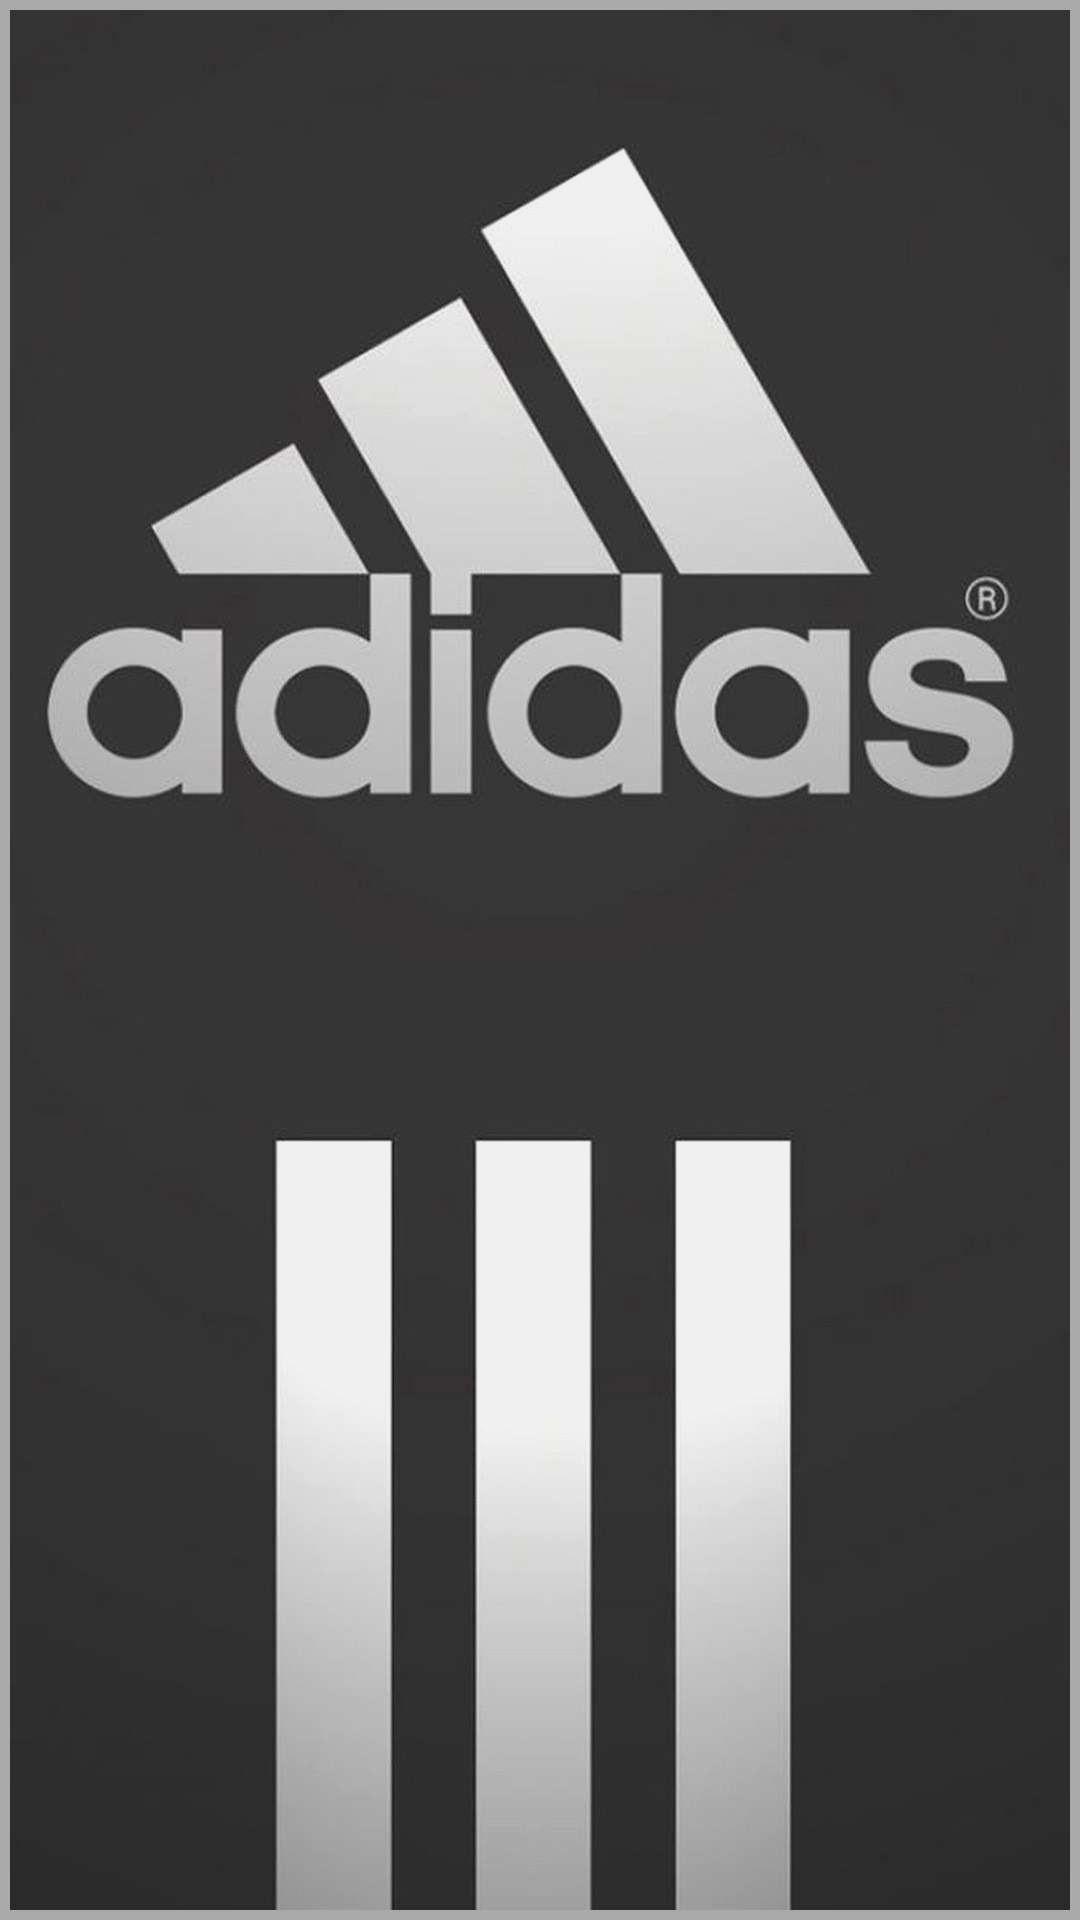 Adidas iPhone 7 wallpaper